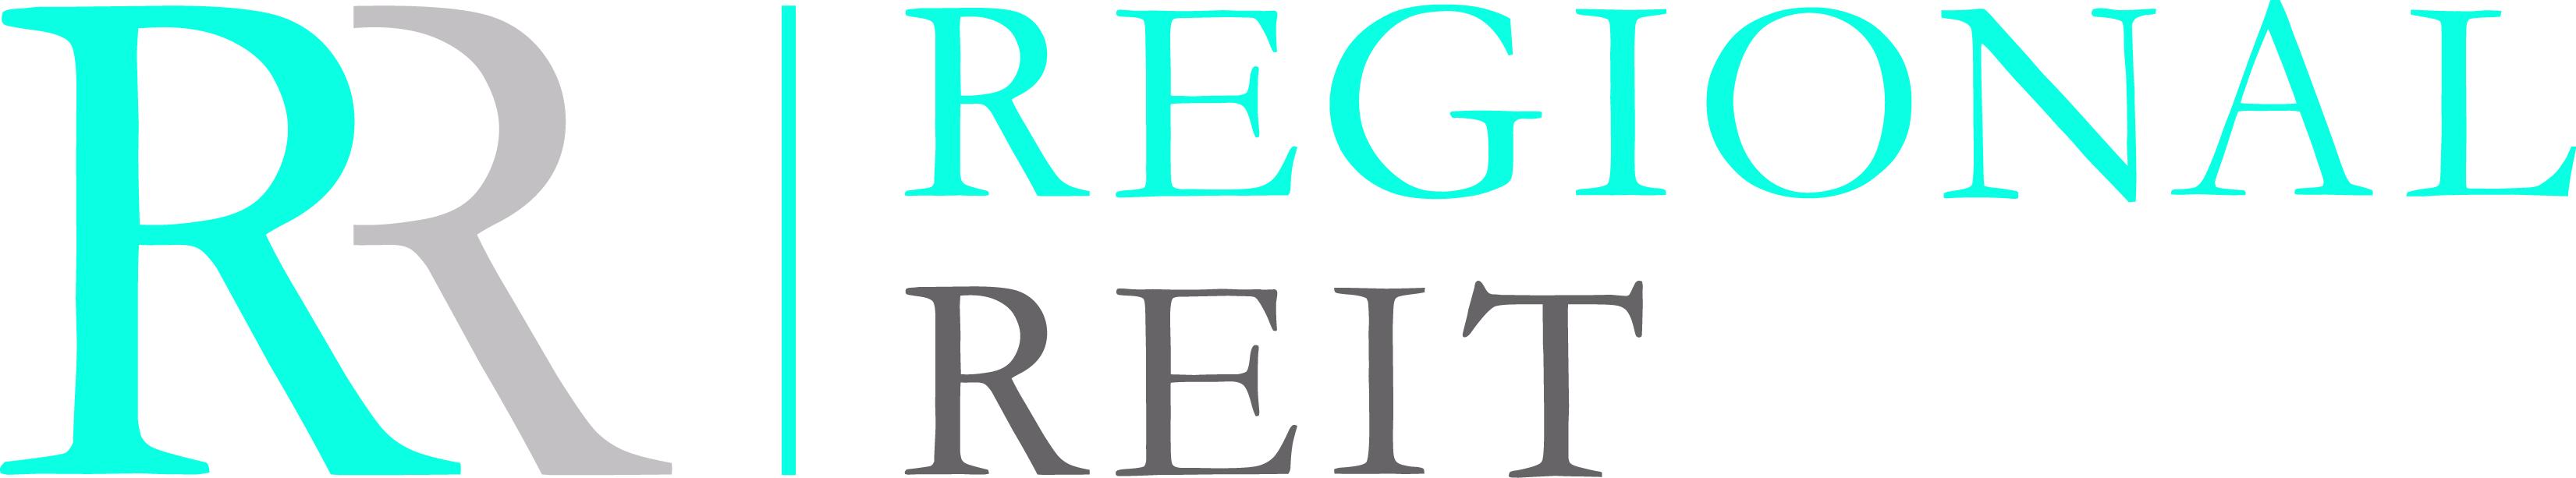 Regional REIT Limited